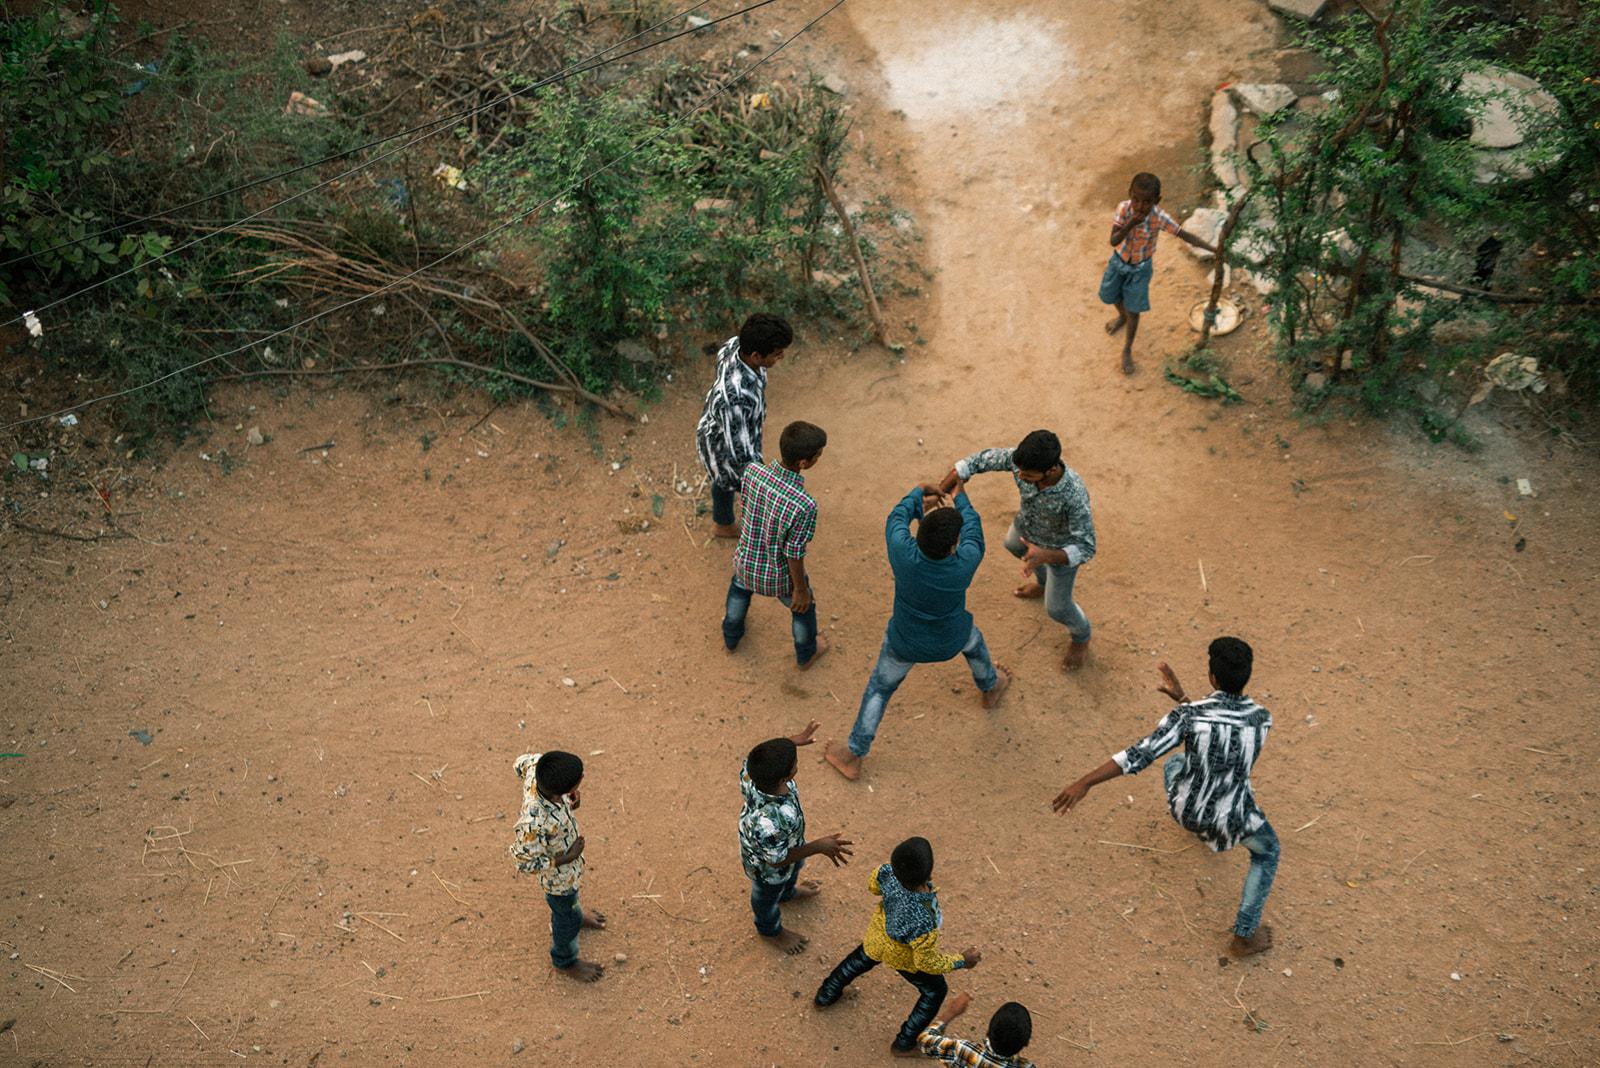 CCH_INDIA_HUMANITARIAN_NGO_TaraShupe_Photography_DSC_6222.jpg